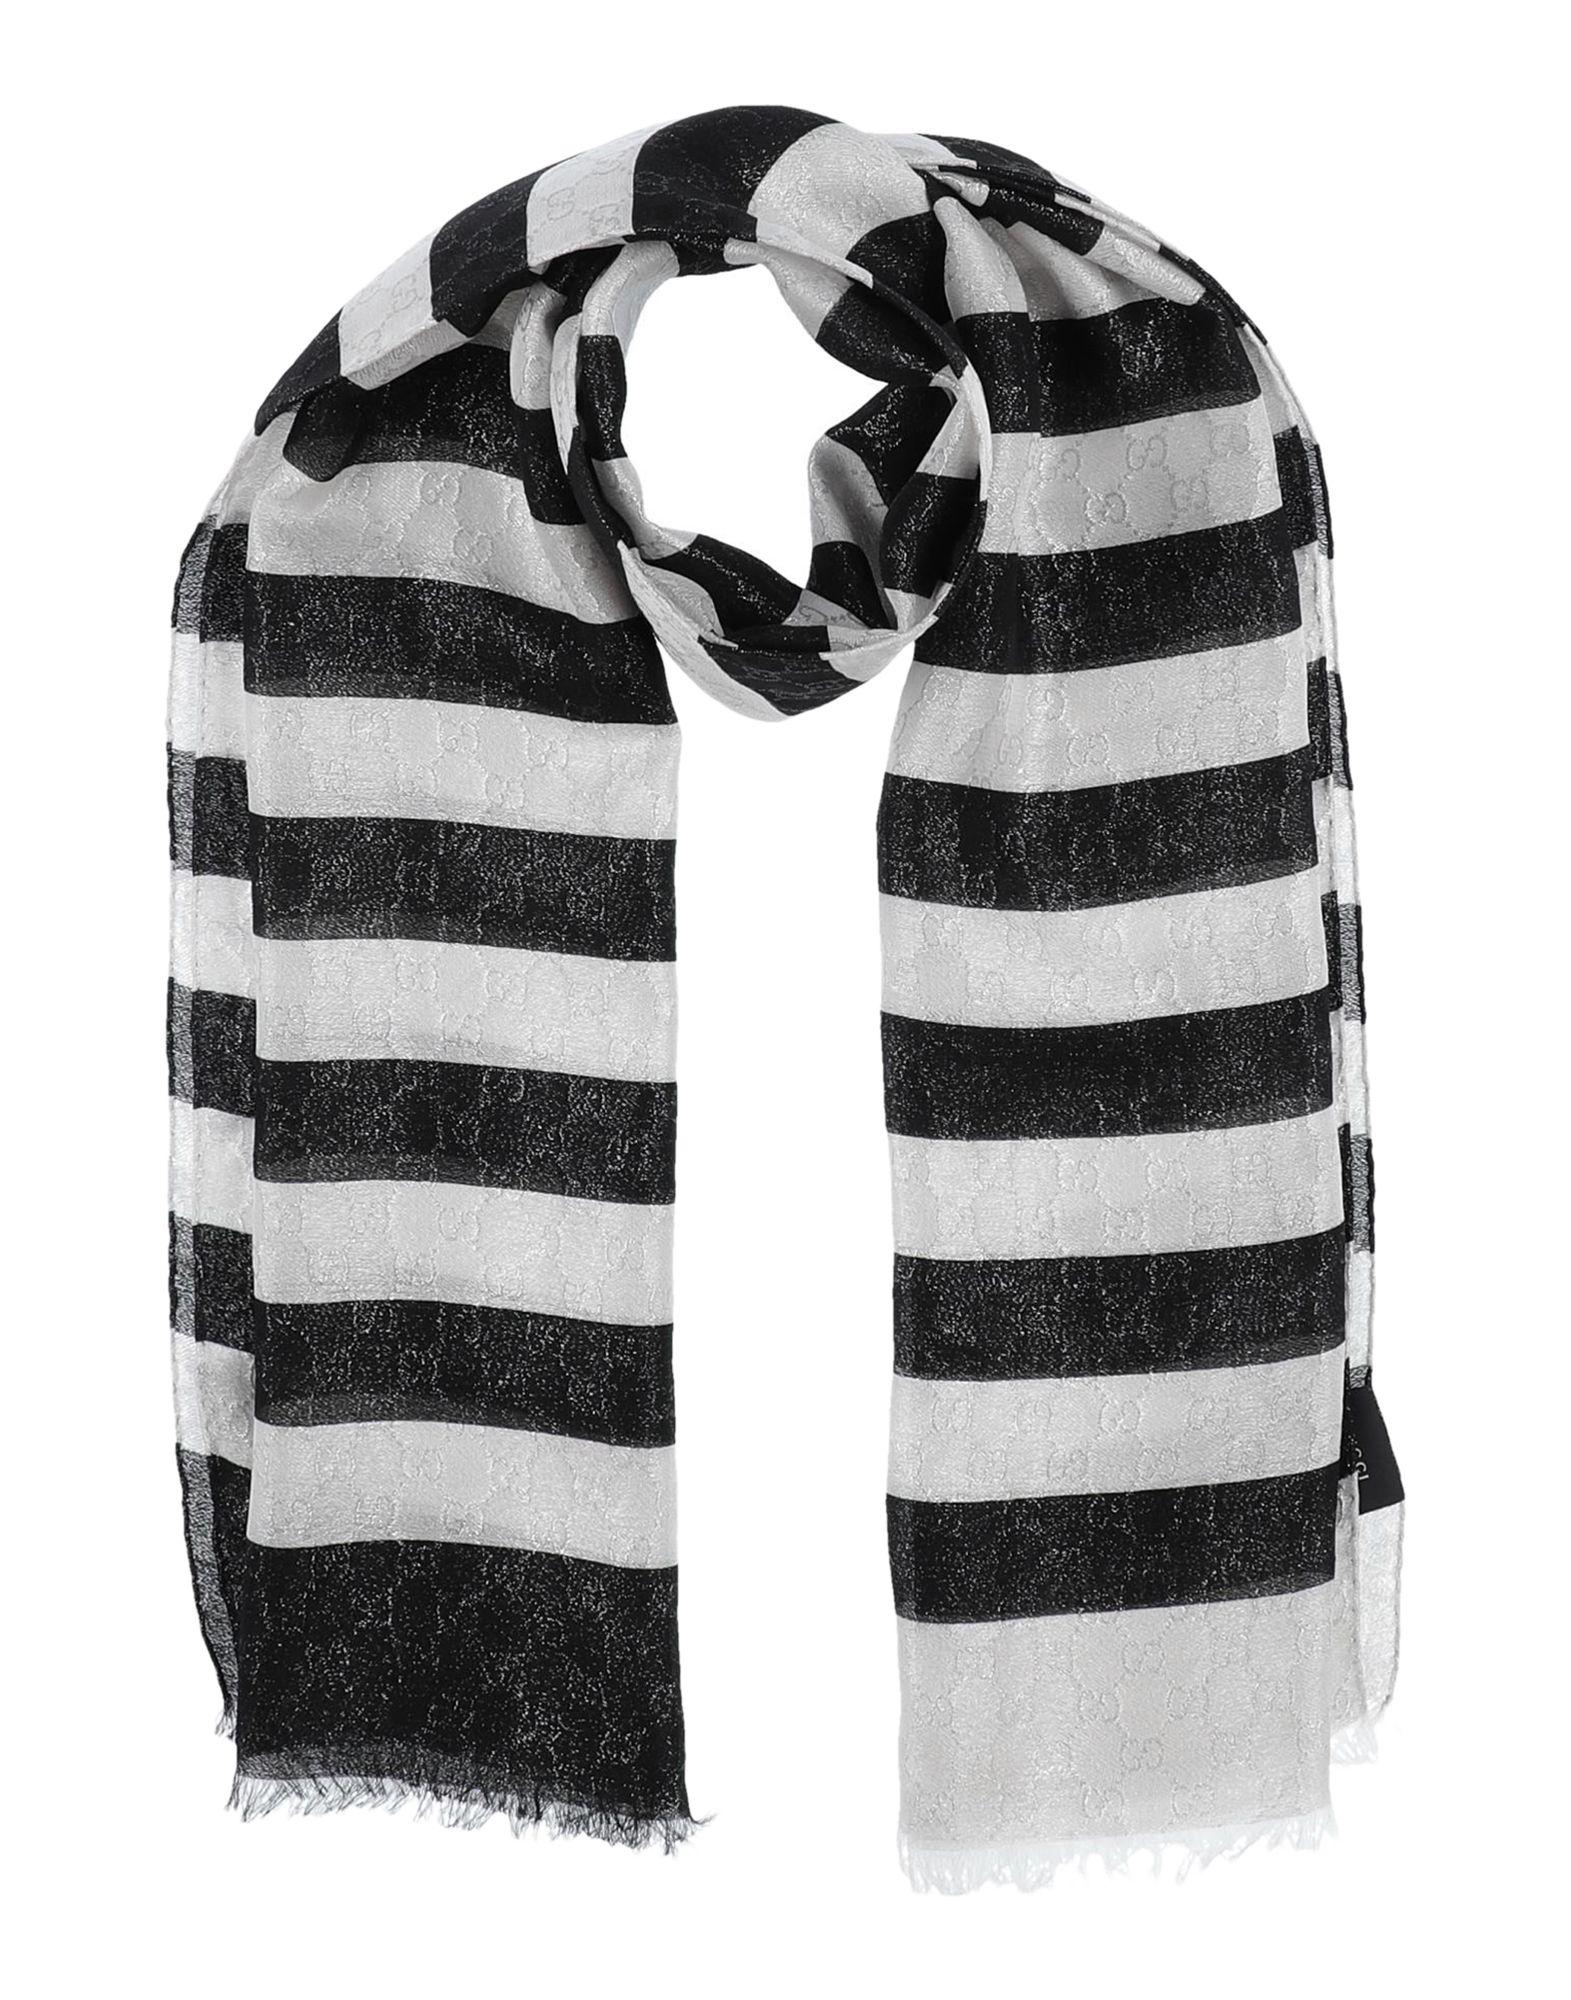 GUCCI Stoles. crepe, lamé, fringed, logo, stripes. 78% Silk, 22% Polyamide